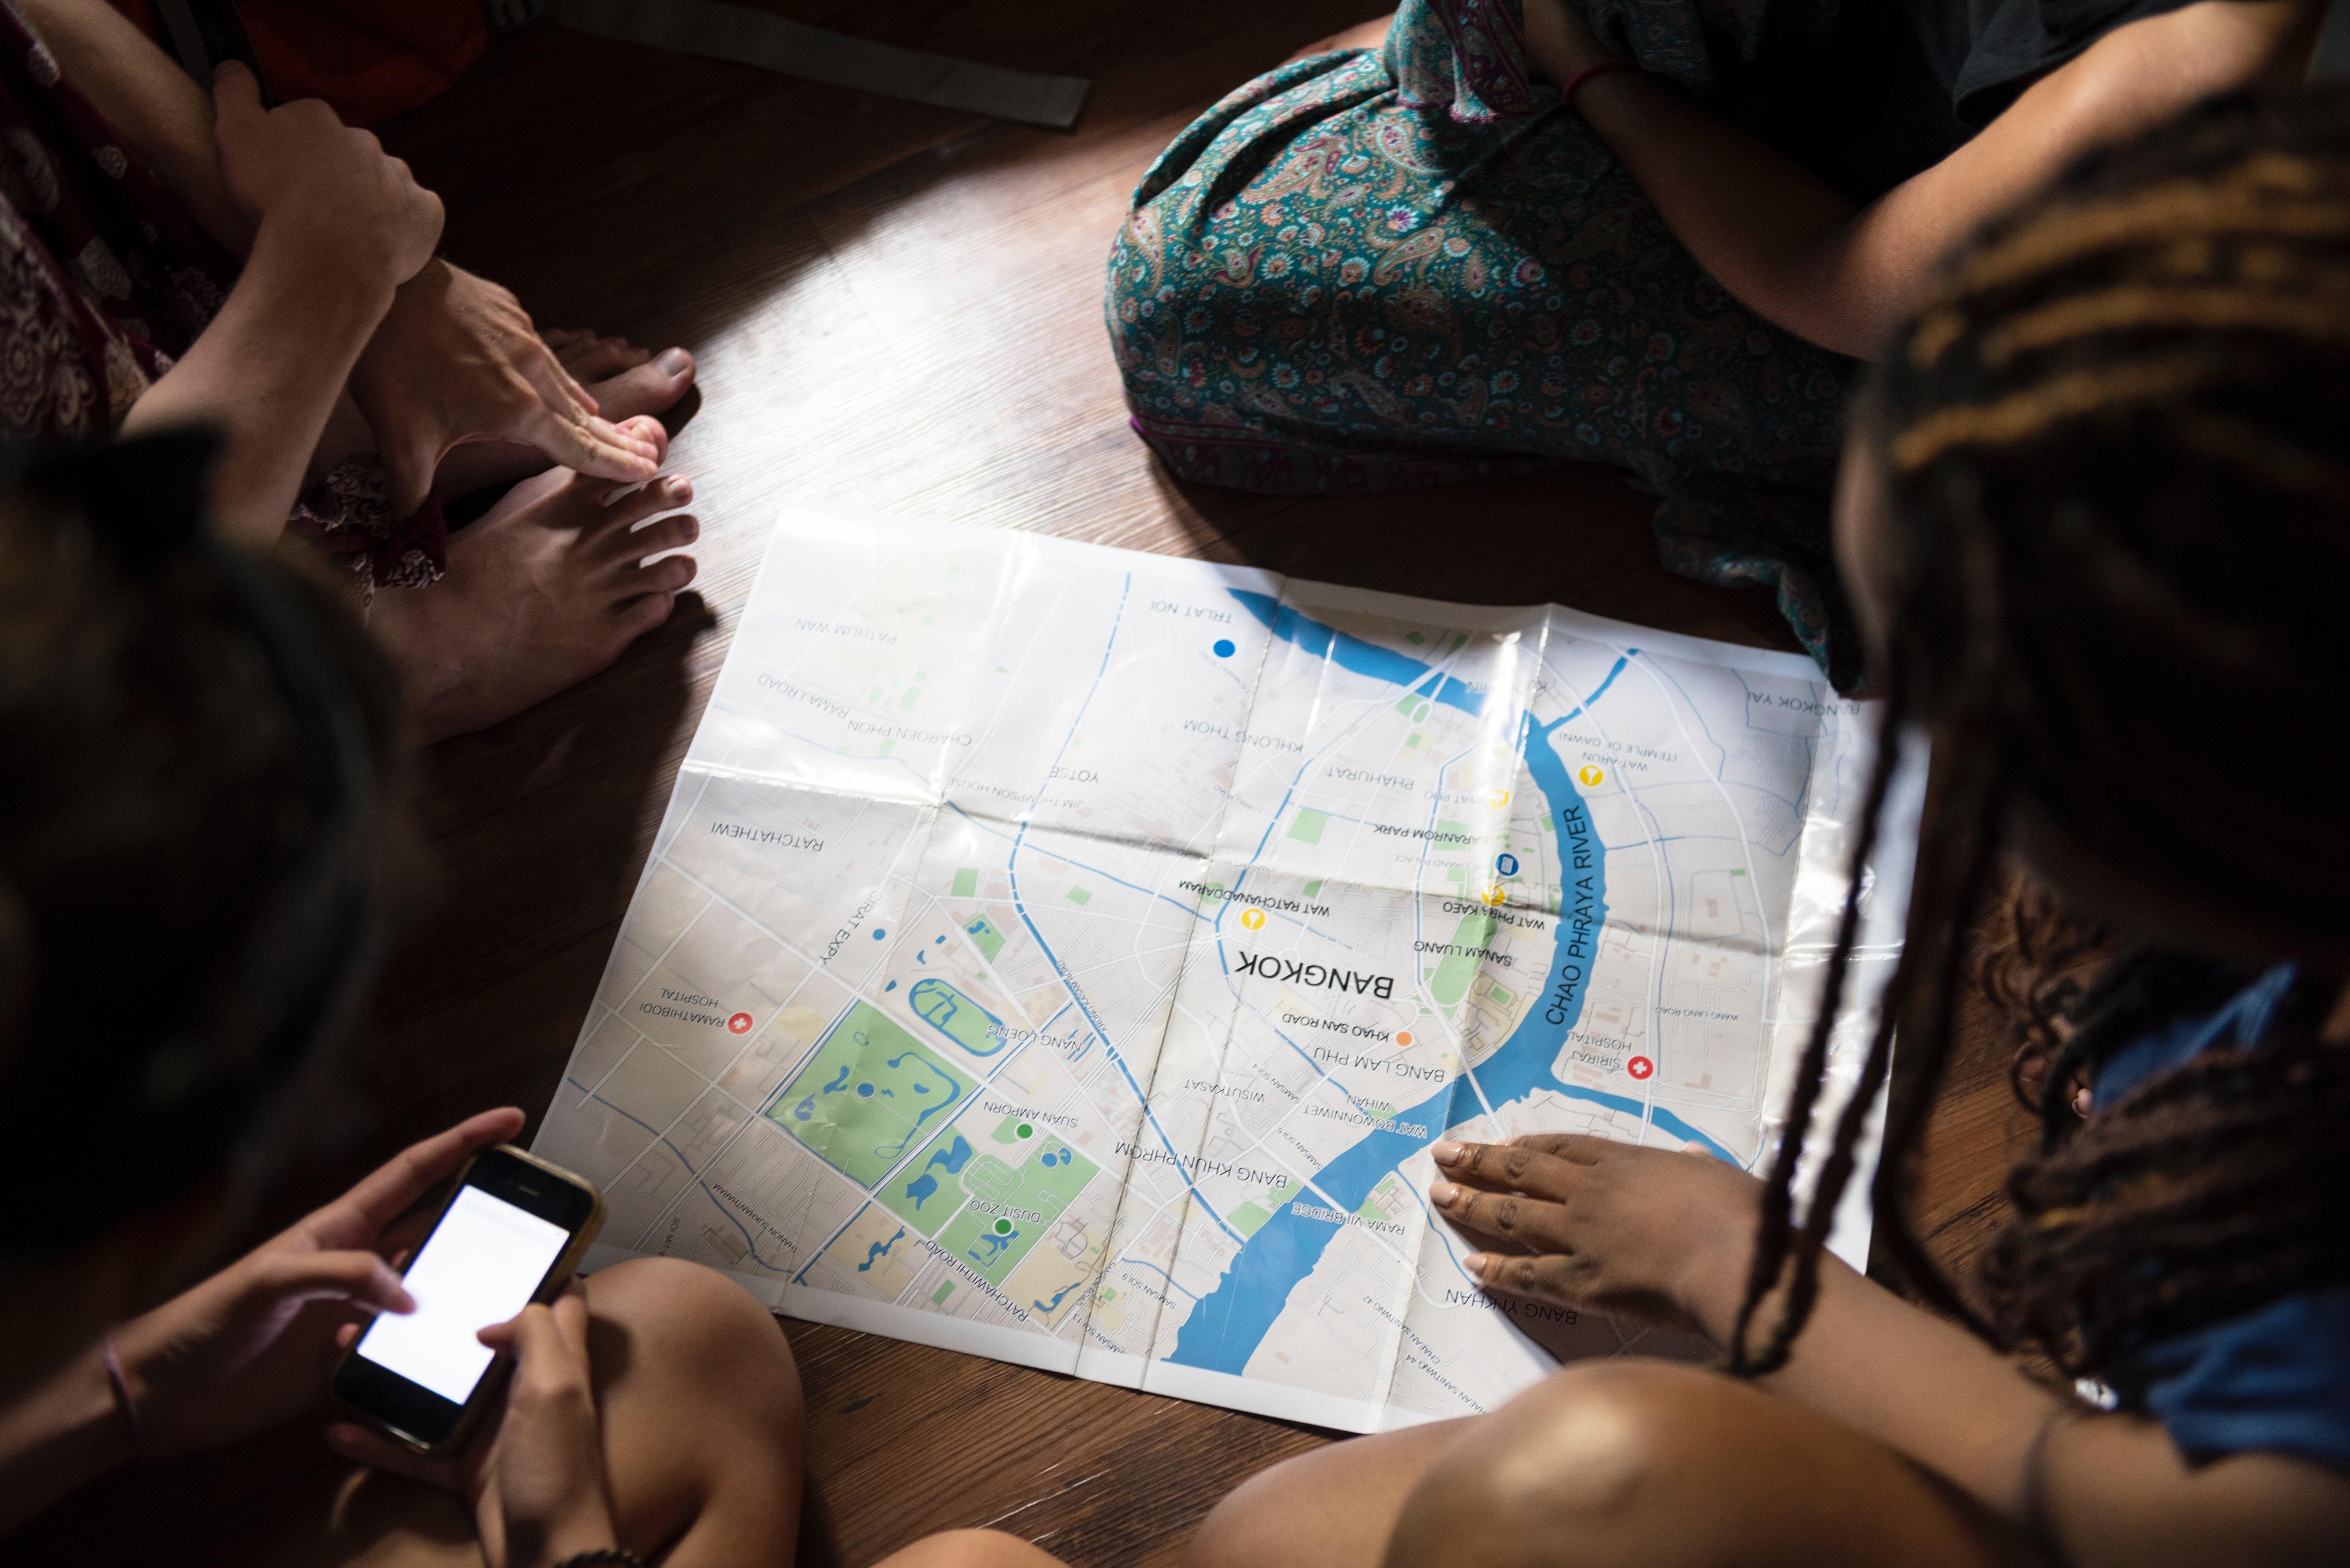 Bangkok Map, Asia, Phone, Travel, Tourists, HQ Photo